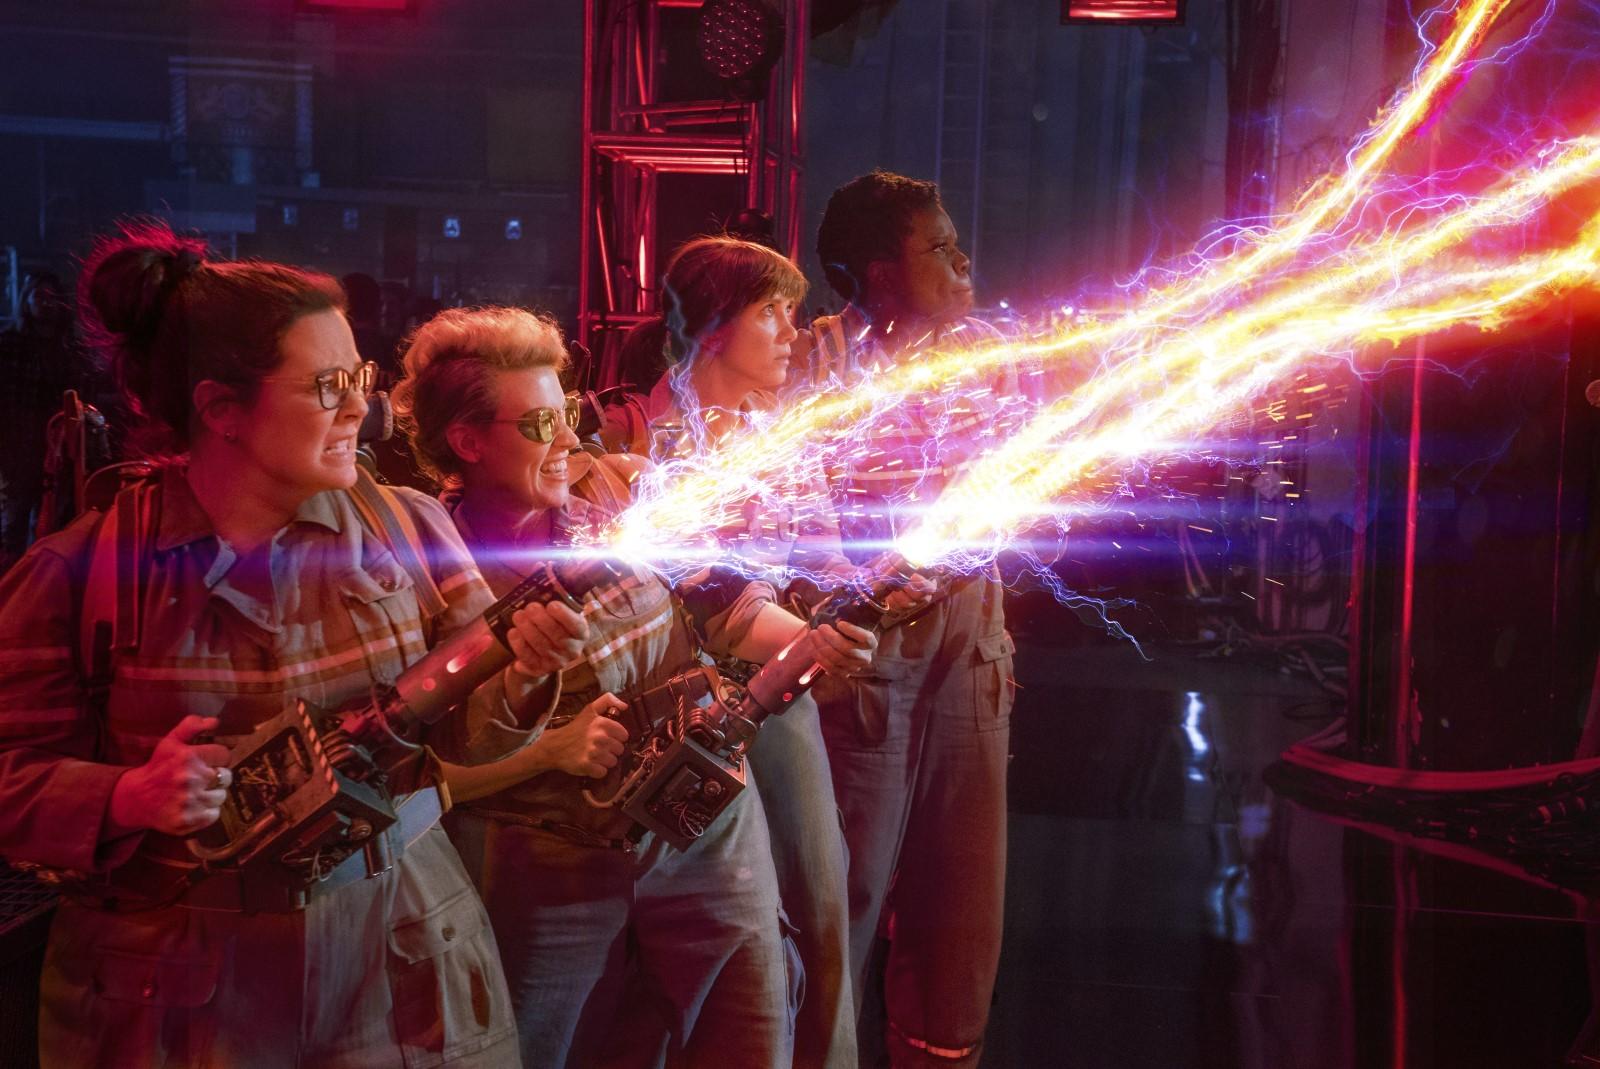 Ghostbusters SOS Fantômes 2016 Kate McKinnon, Kristen Wiig, Leslie Jones (II), Melissa McCarthy